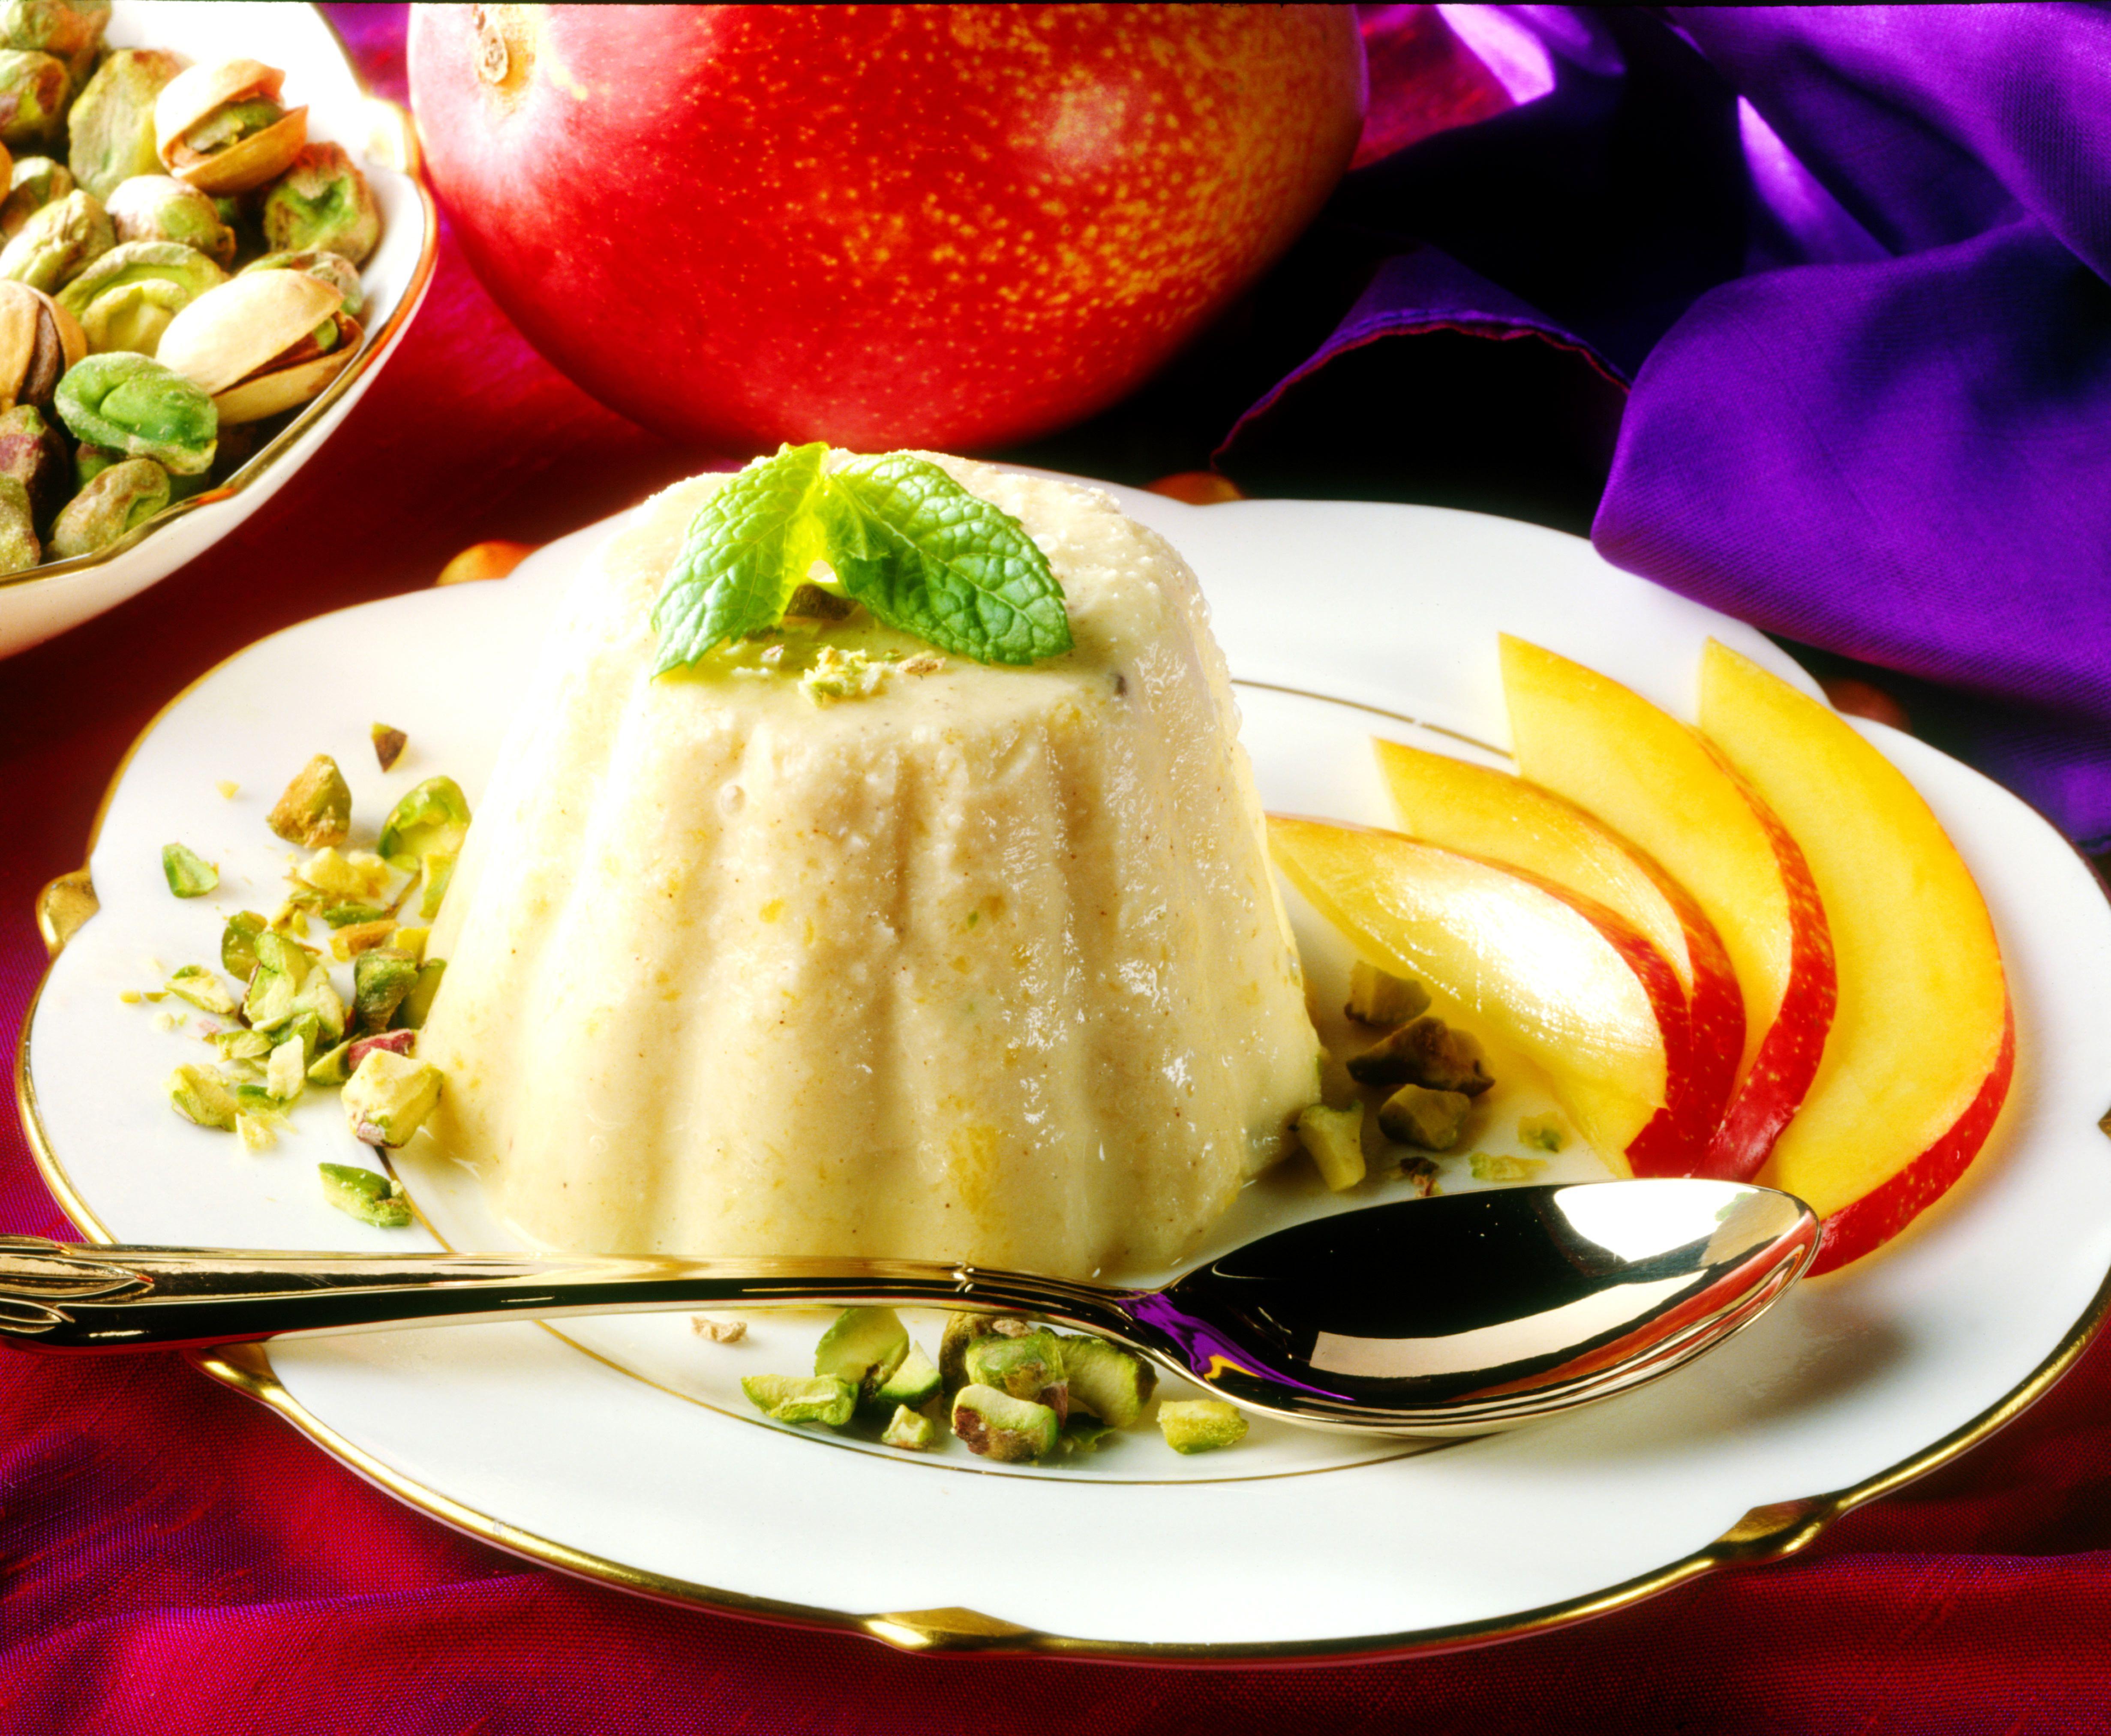 Kulfi - Indian ice cream with pistachios